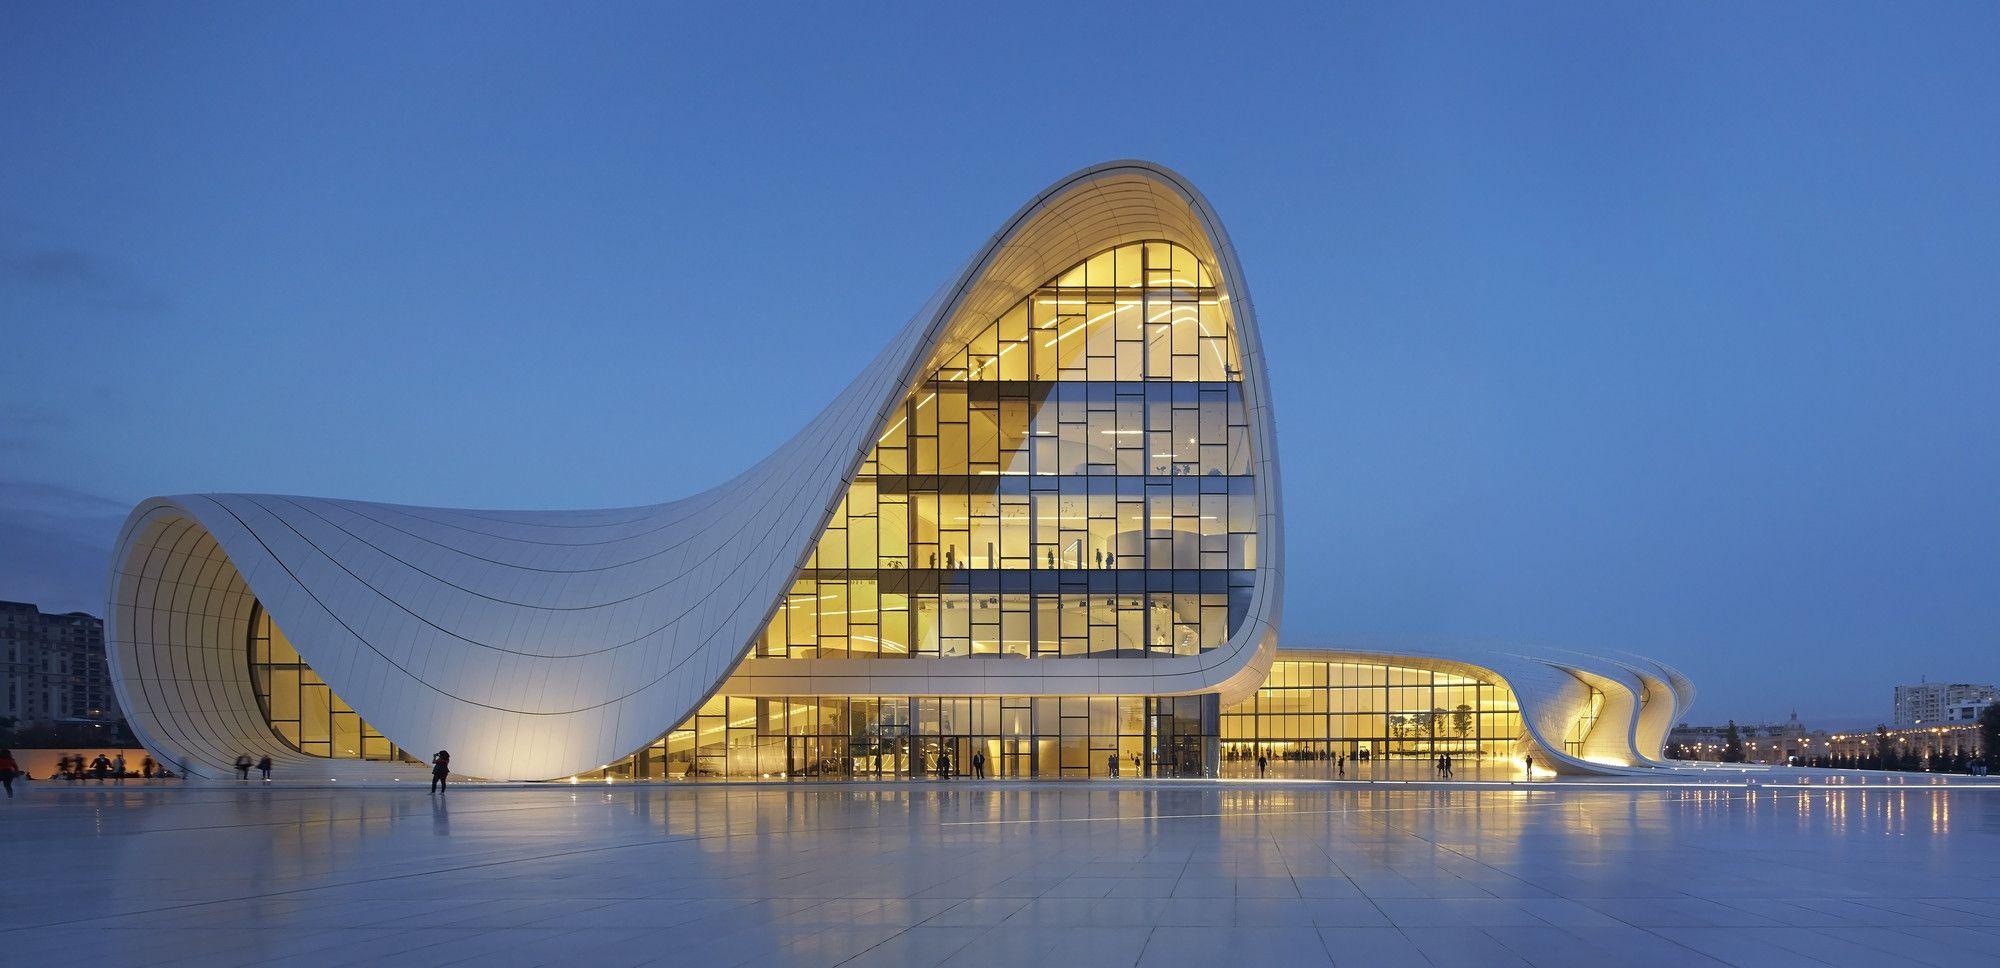 Gallery Of Heydar Aliyev Center Zaha Hadid Architects 26 Zaha Hadid Design Zaha Hadid Zaha Hadid Architects